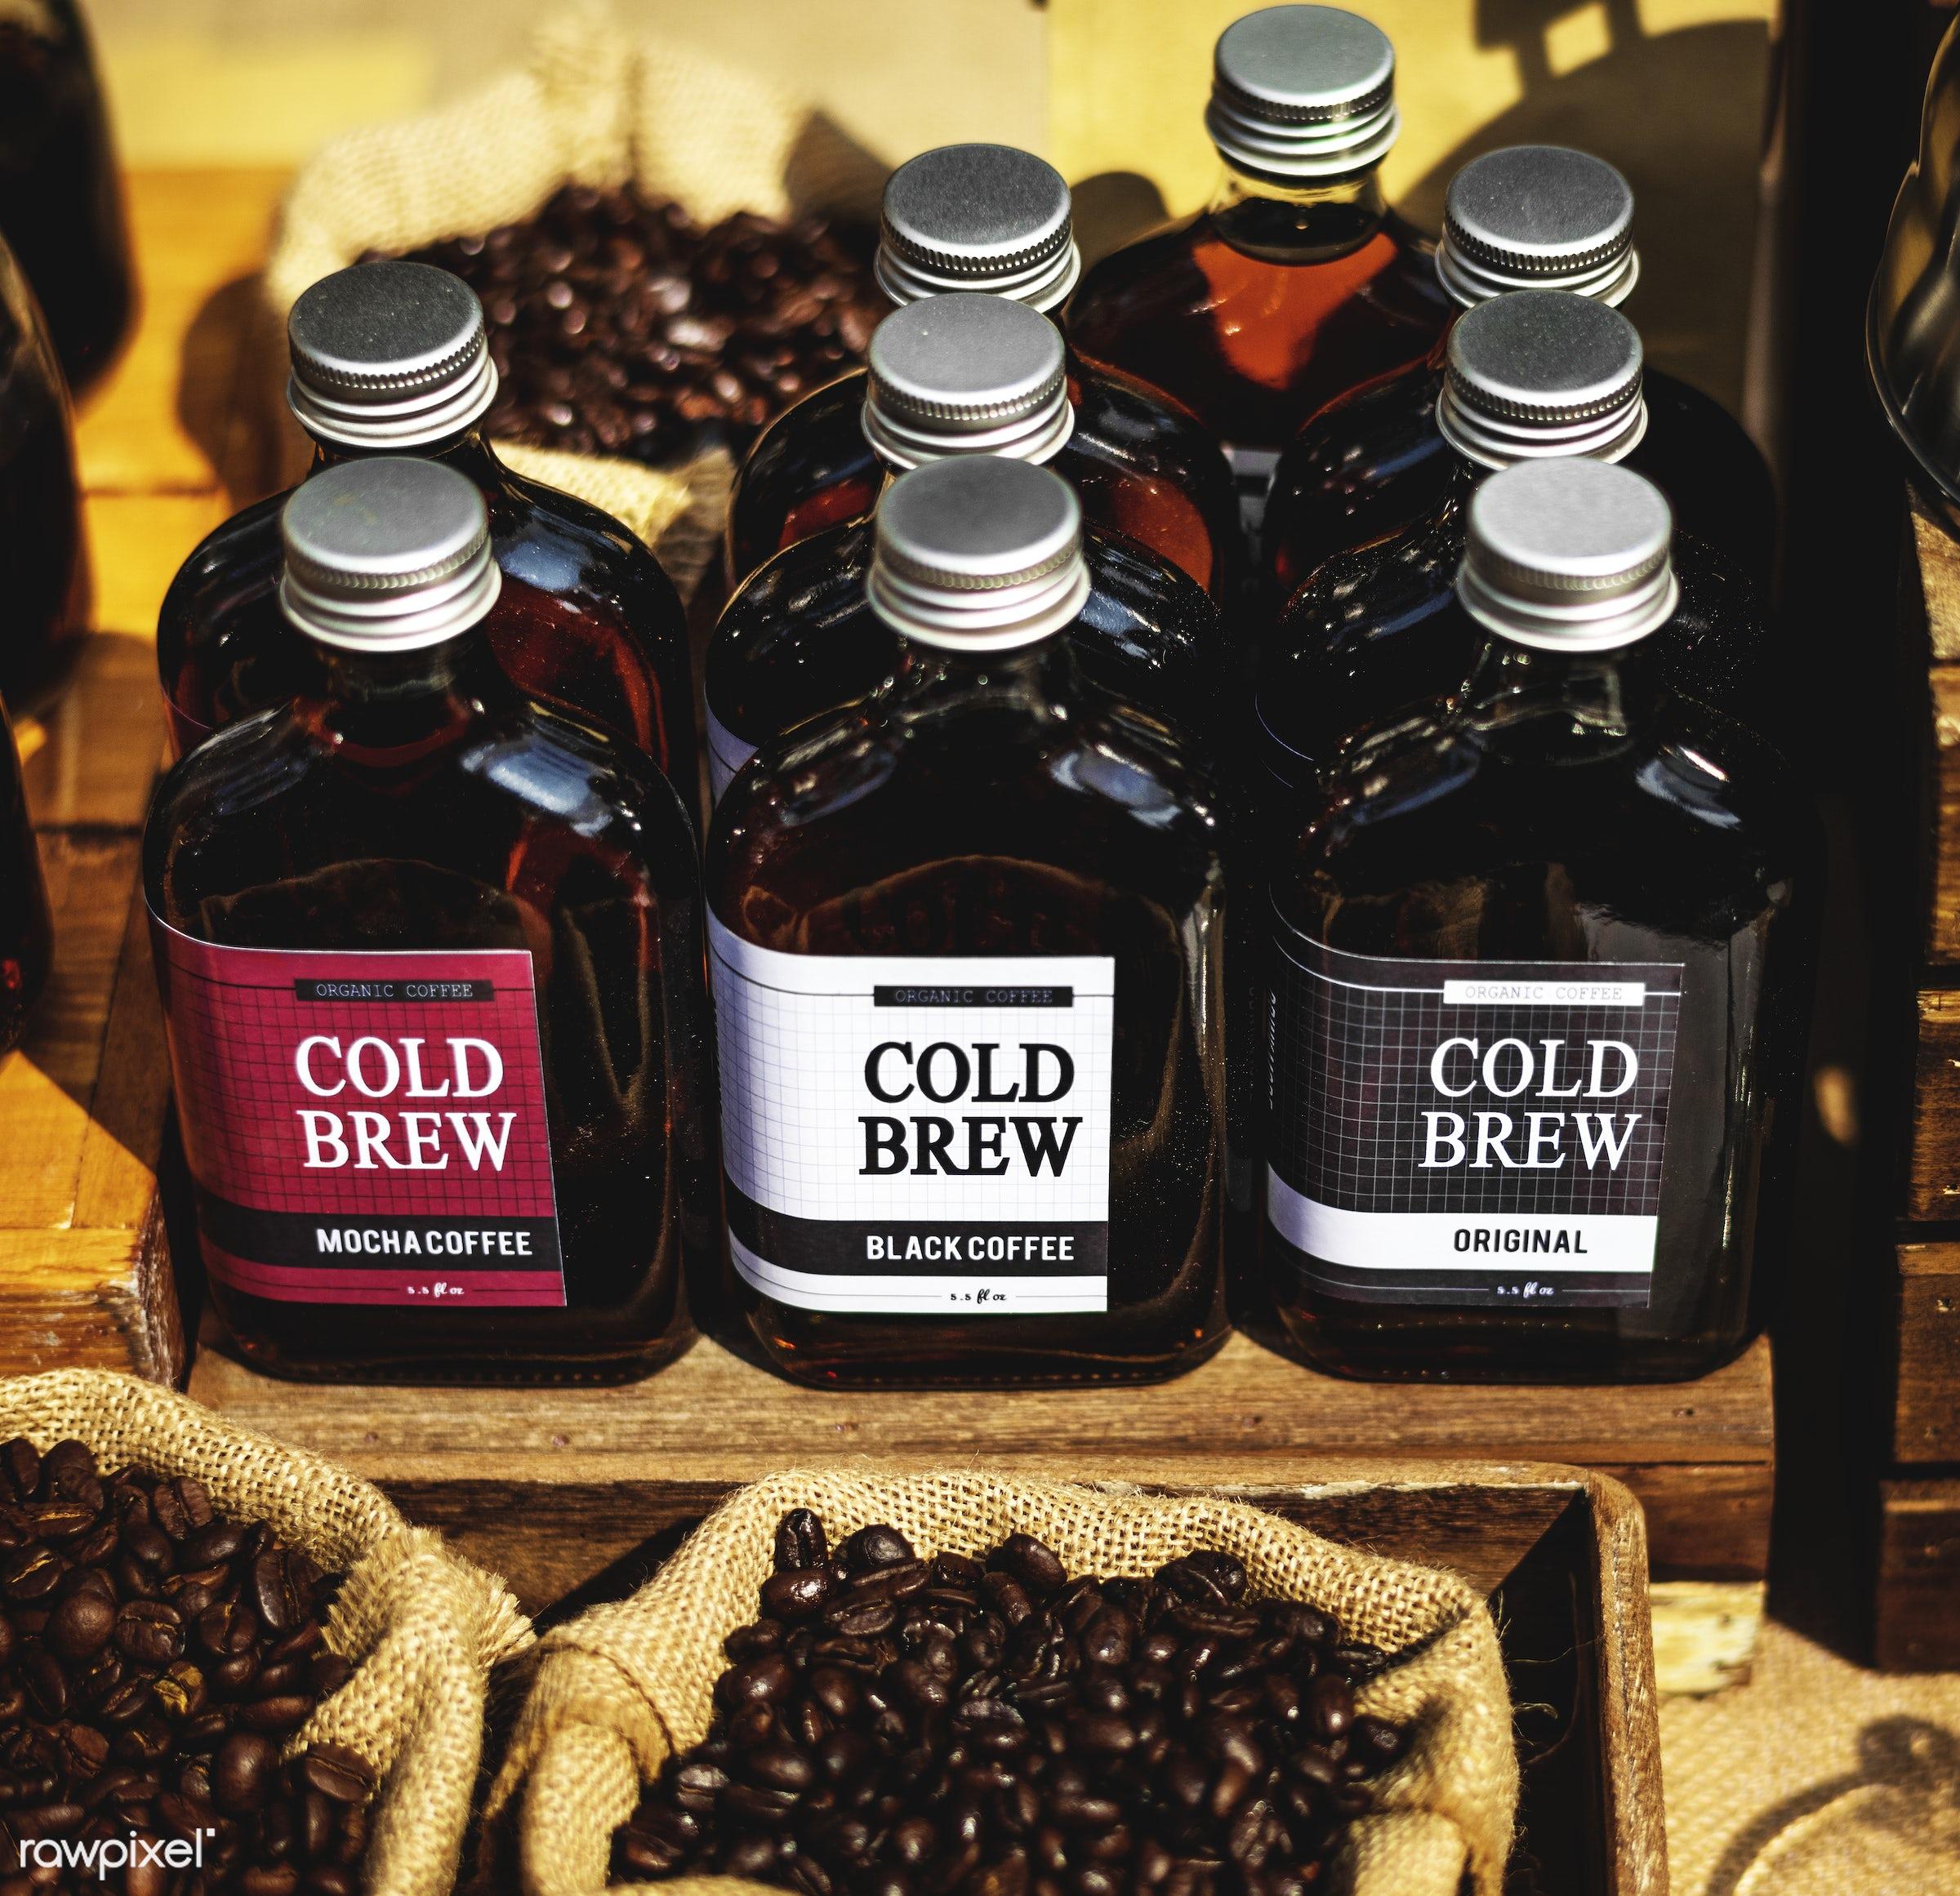 new day, shop, caffeine, drinks, drip, coffee bean, fresh, brew, refresh, baguette, beginning, refreshment, coffee,...